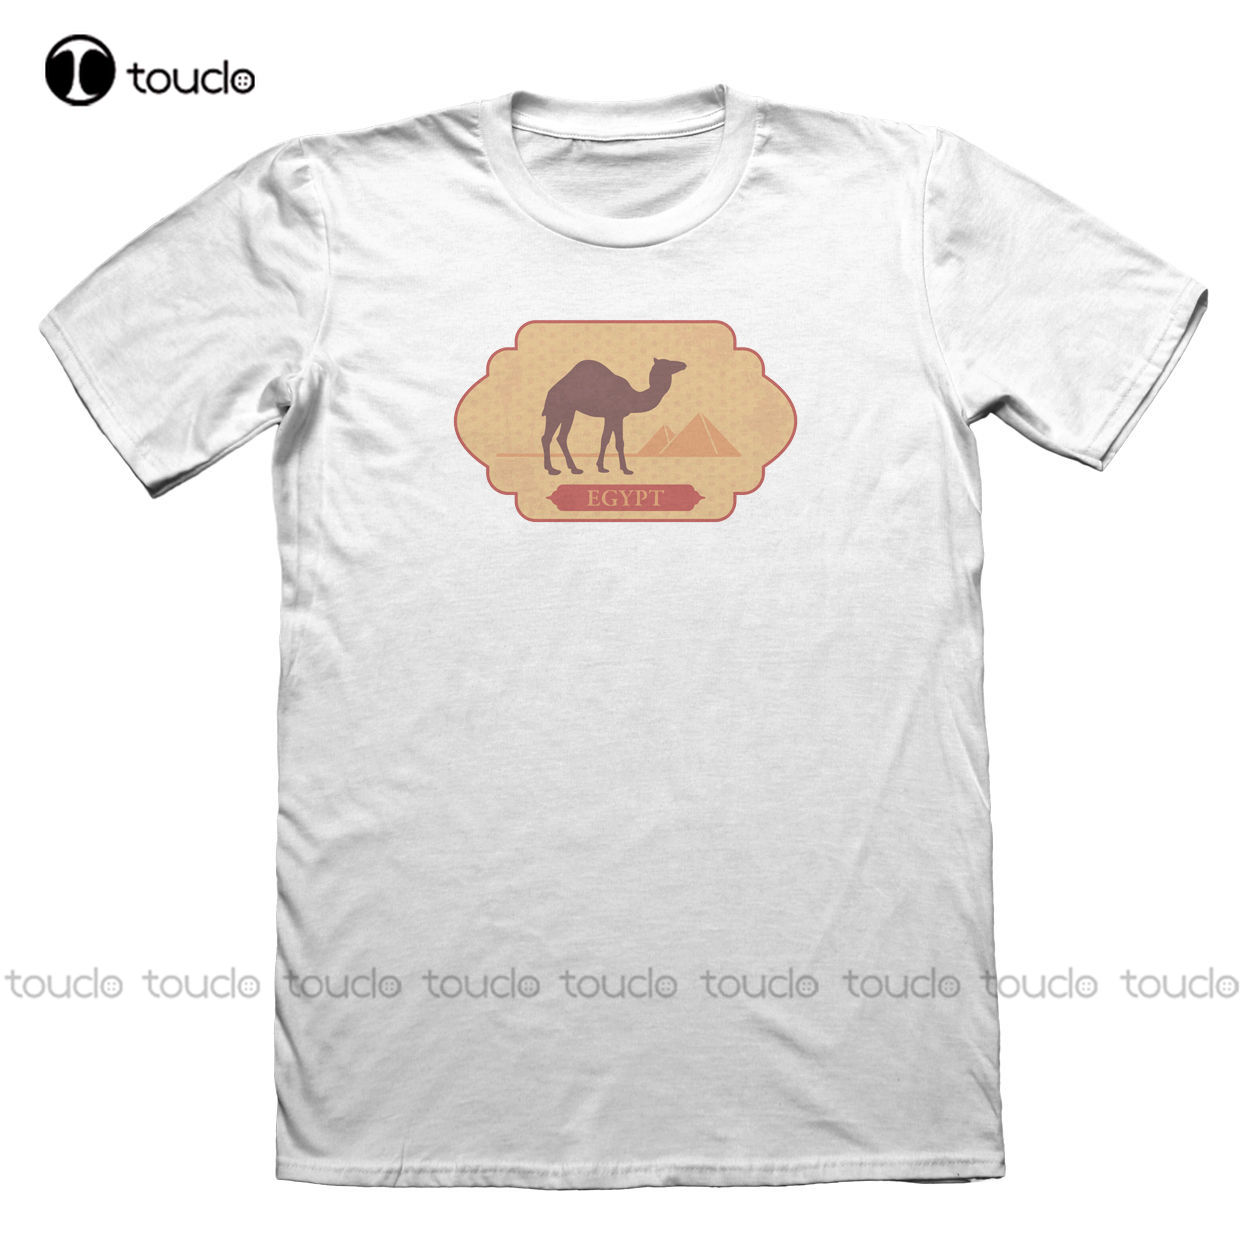 Summer Fashion Streetwear Tops Summer Style Cotton Short Slevee Egypt Design T-Shirt - Funny Mens Gi